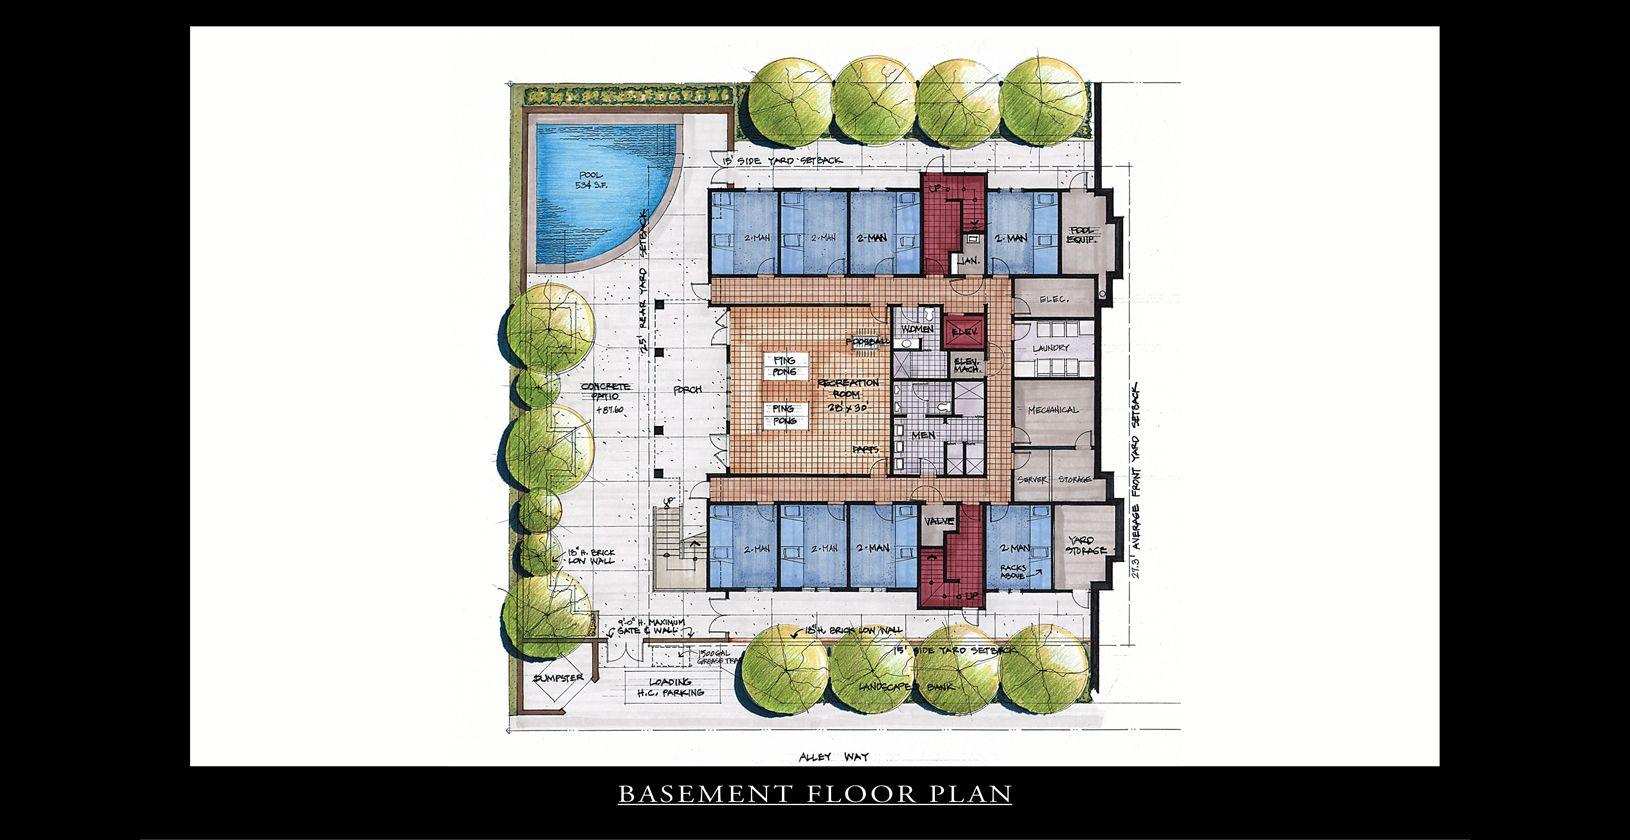 sorority floor plans - Google Search   floorplans   Pinterest ...